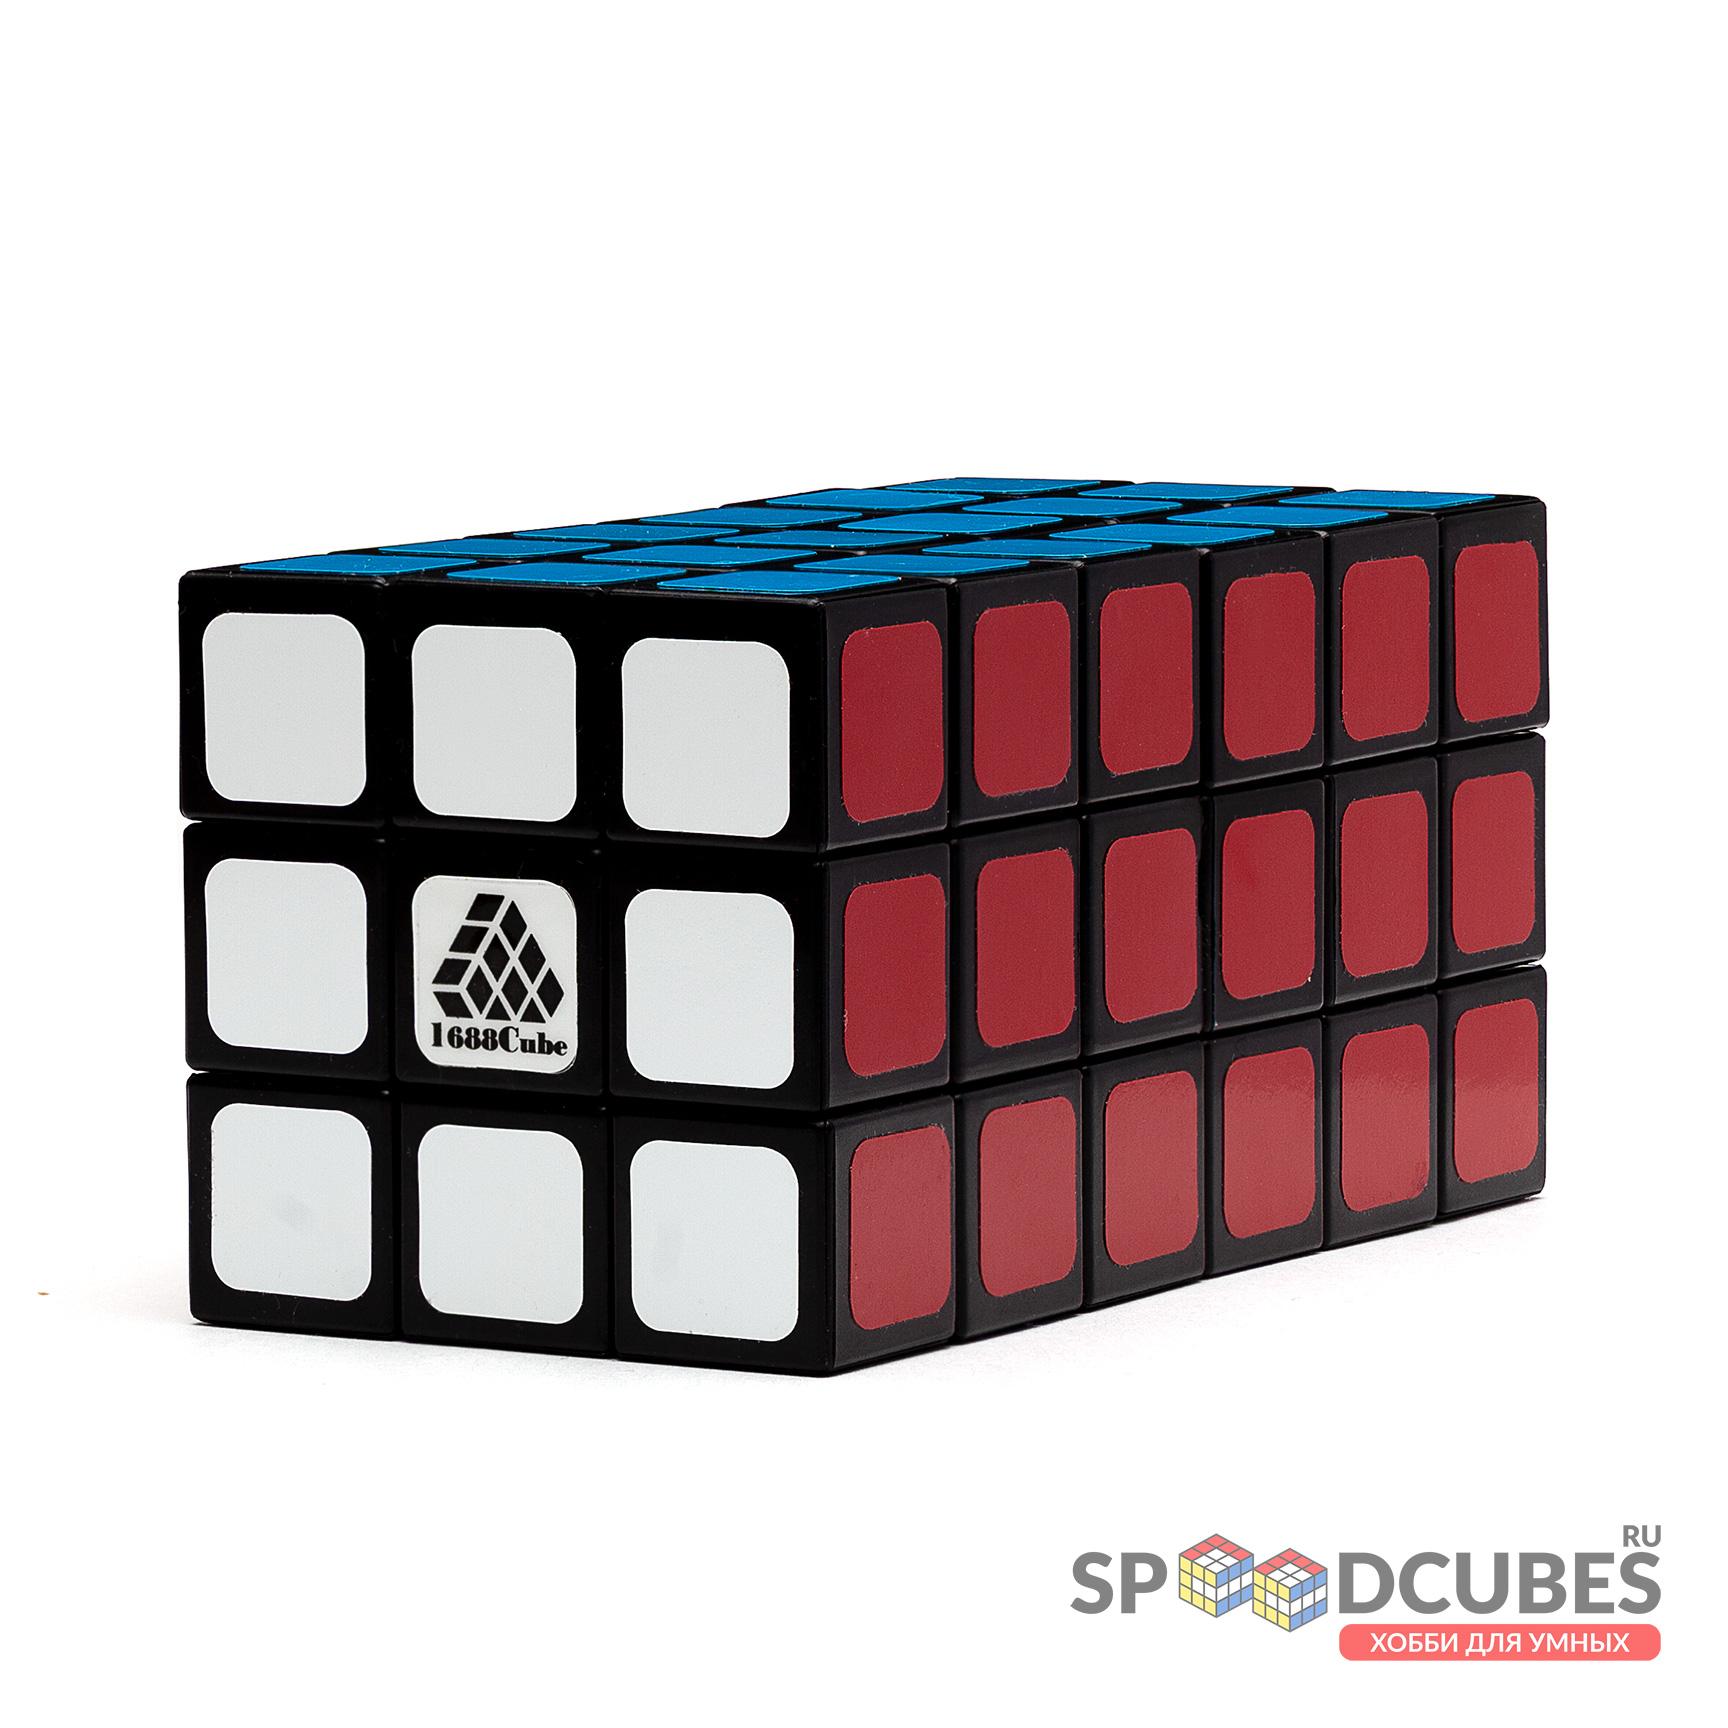 Witeden 3x3x6 Symmetric